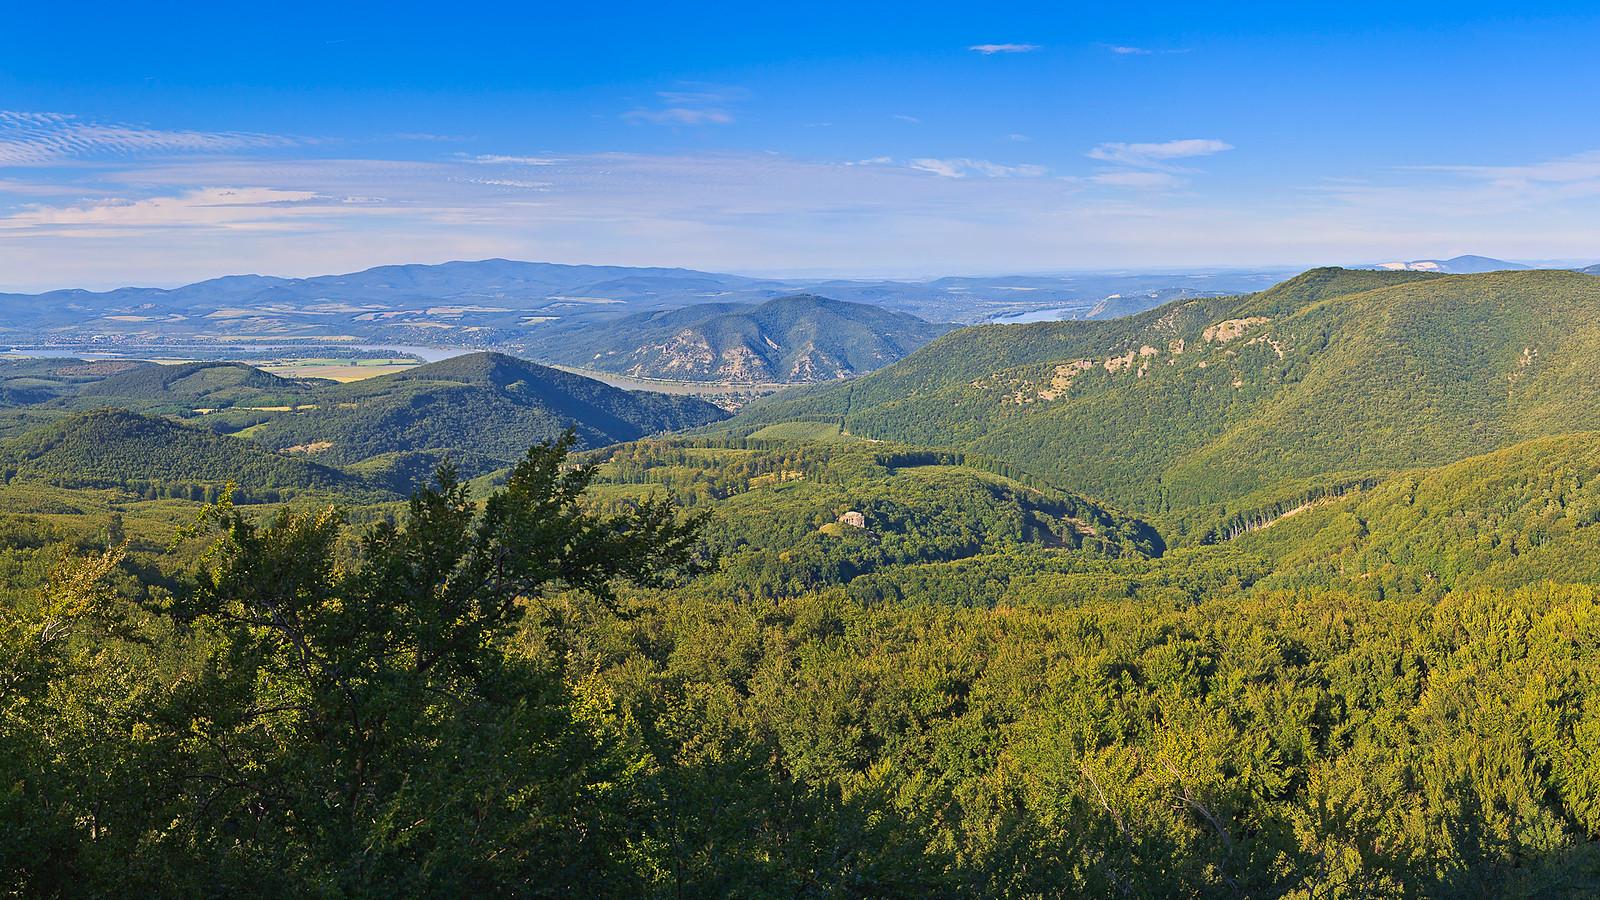 Panorama from Dobogoko mountain to the Danube Bend